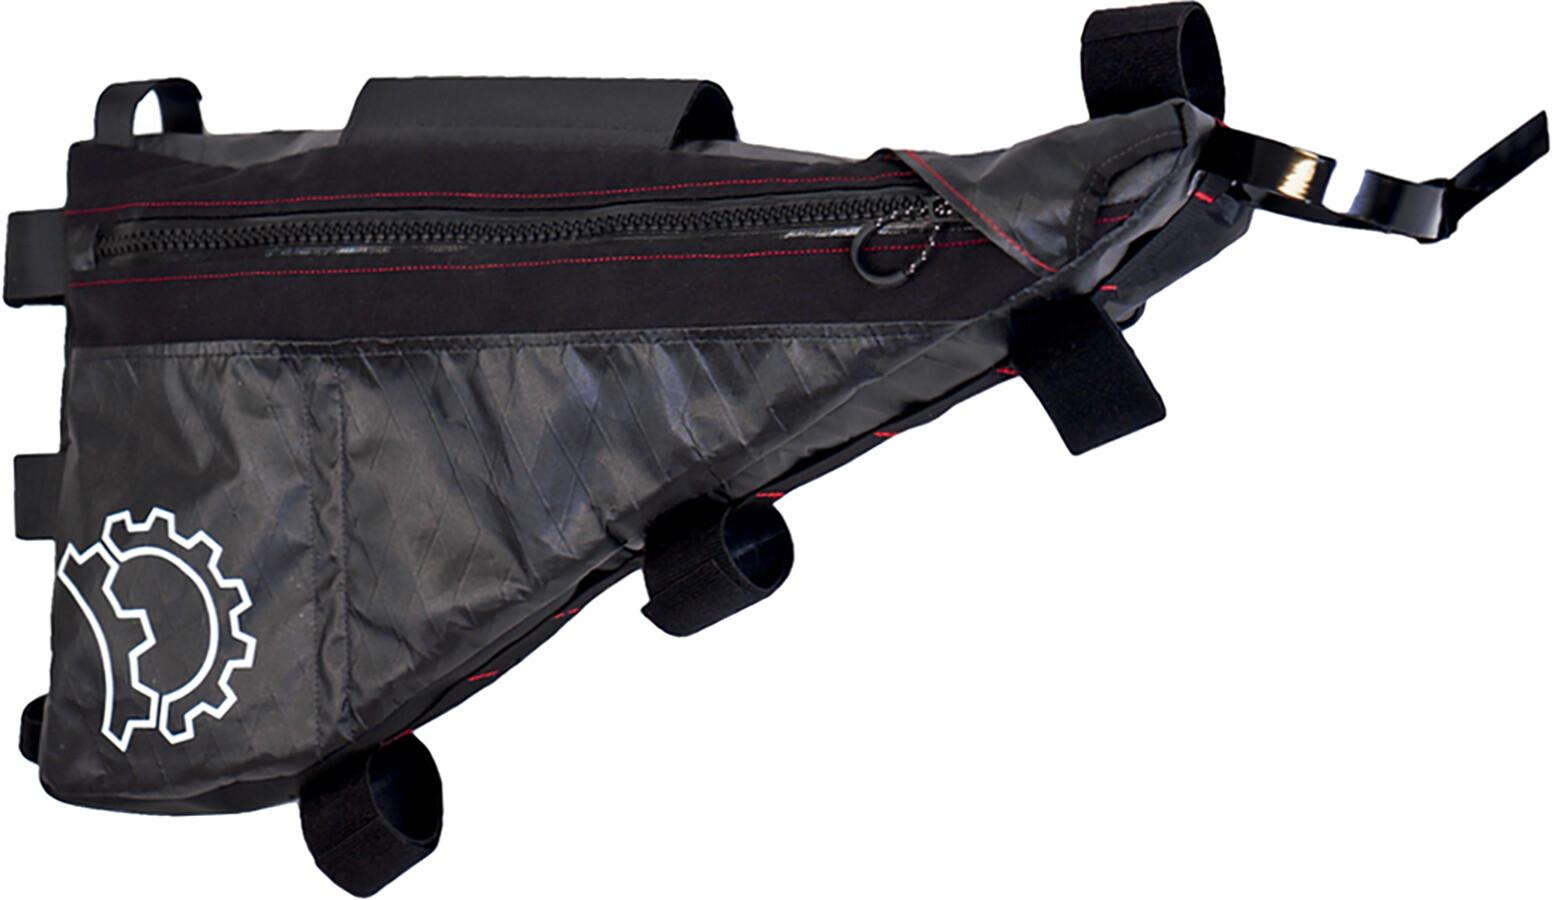 Revelate Designs Ranger Cykeltaske XL, black (2019) | Frame bags